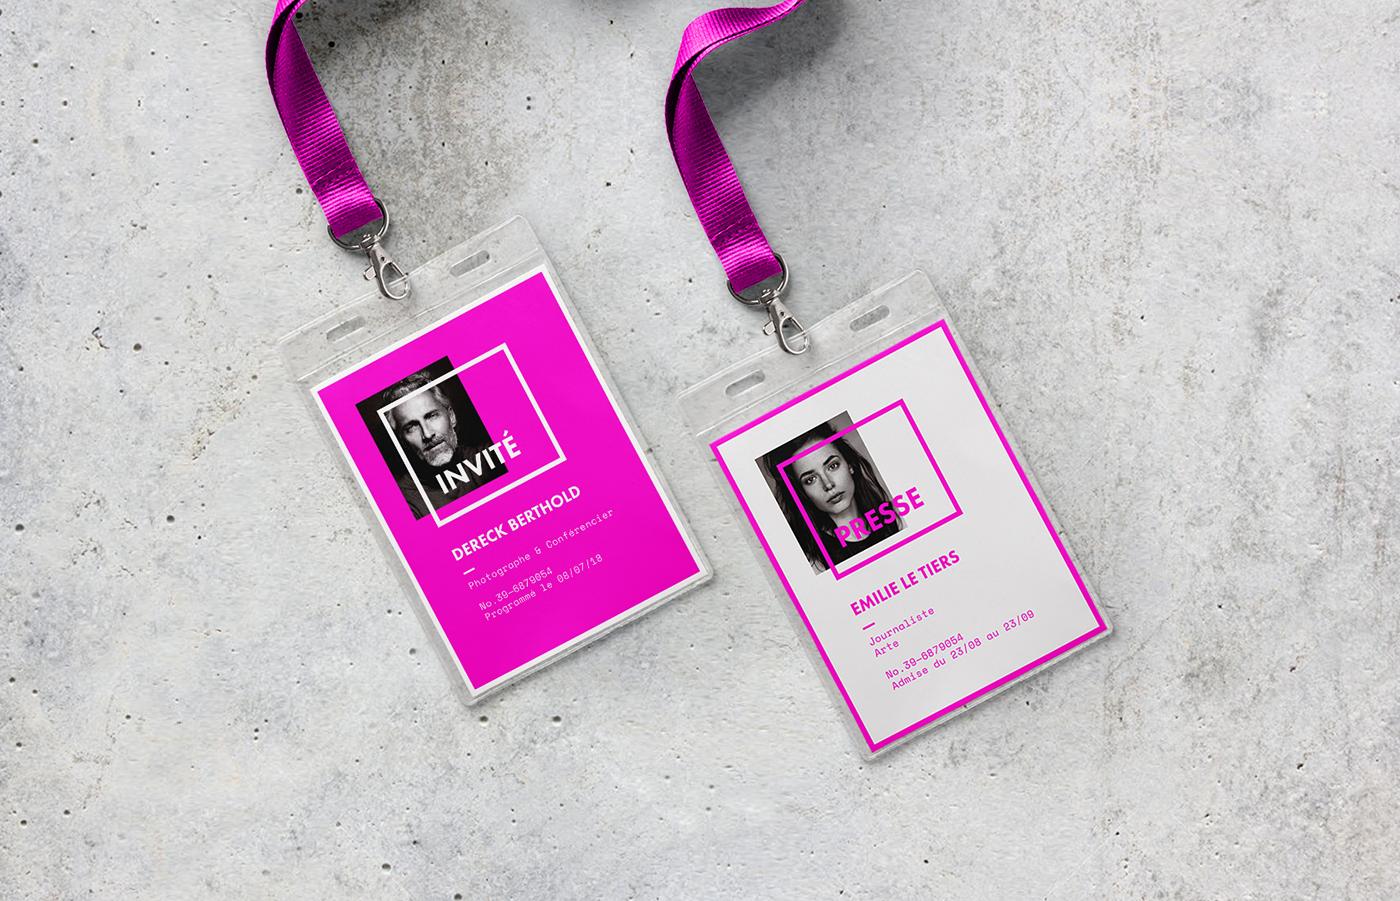 Photography  festival art arles Exhibition  modular identity geometric fluorescent contemporary